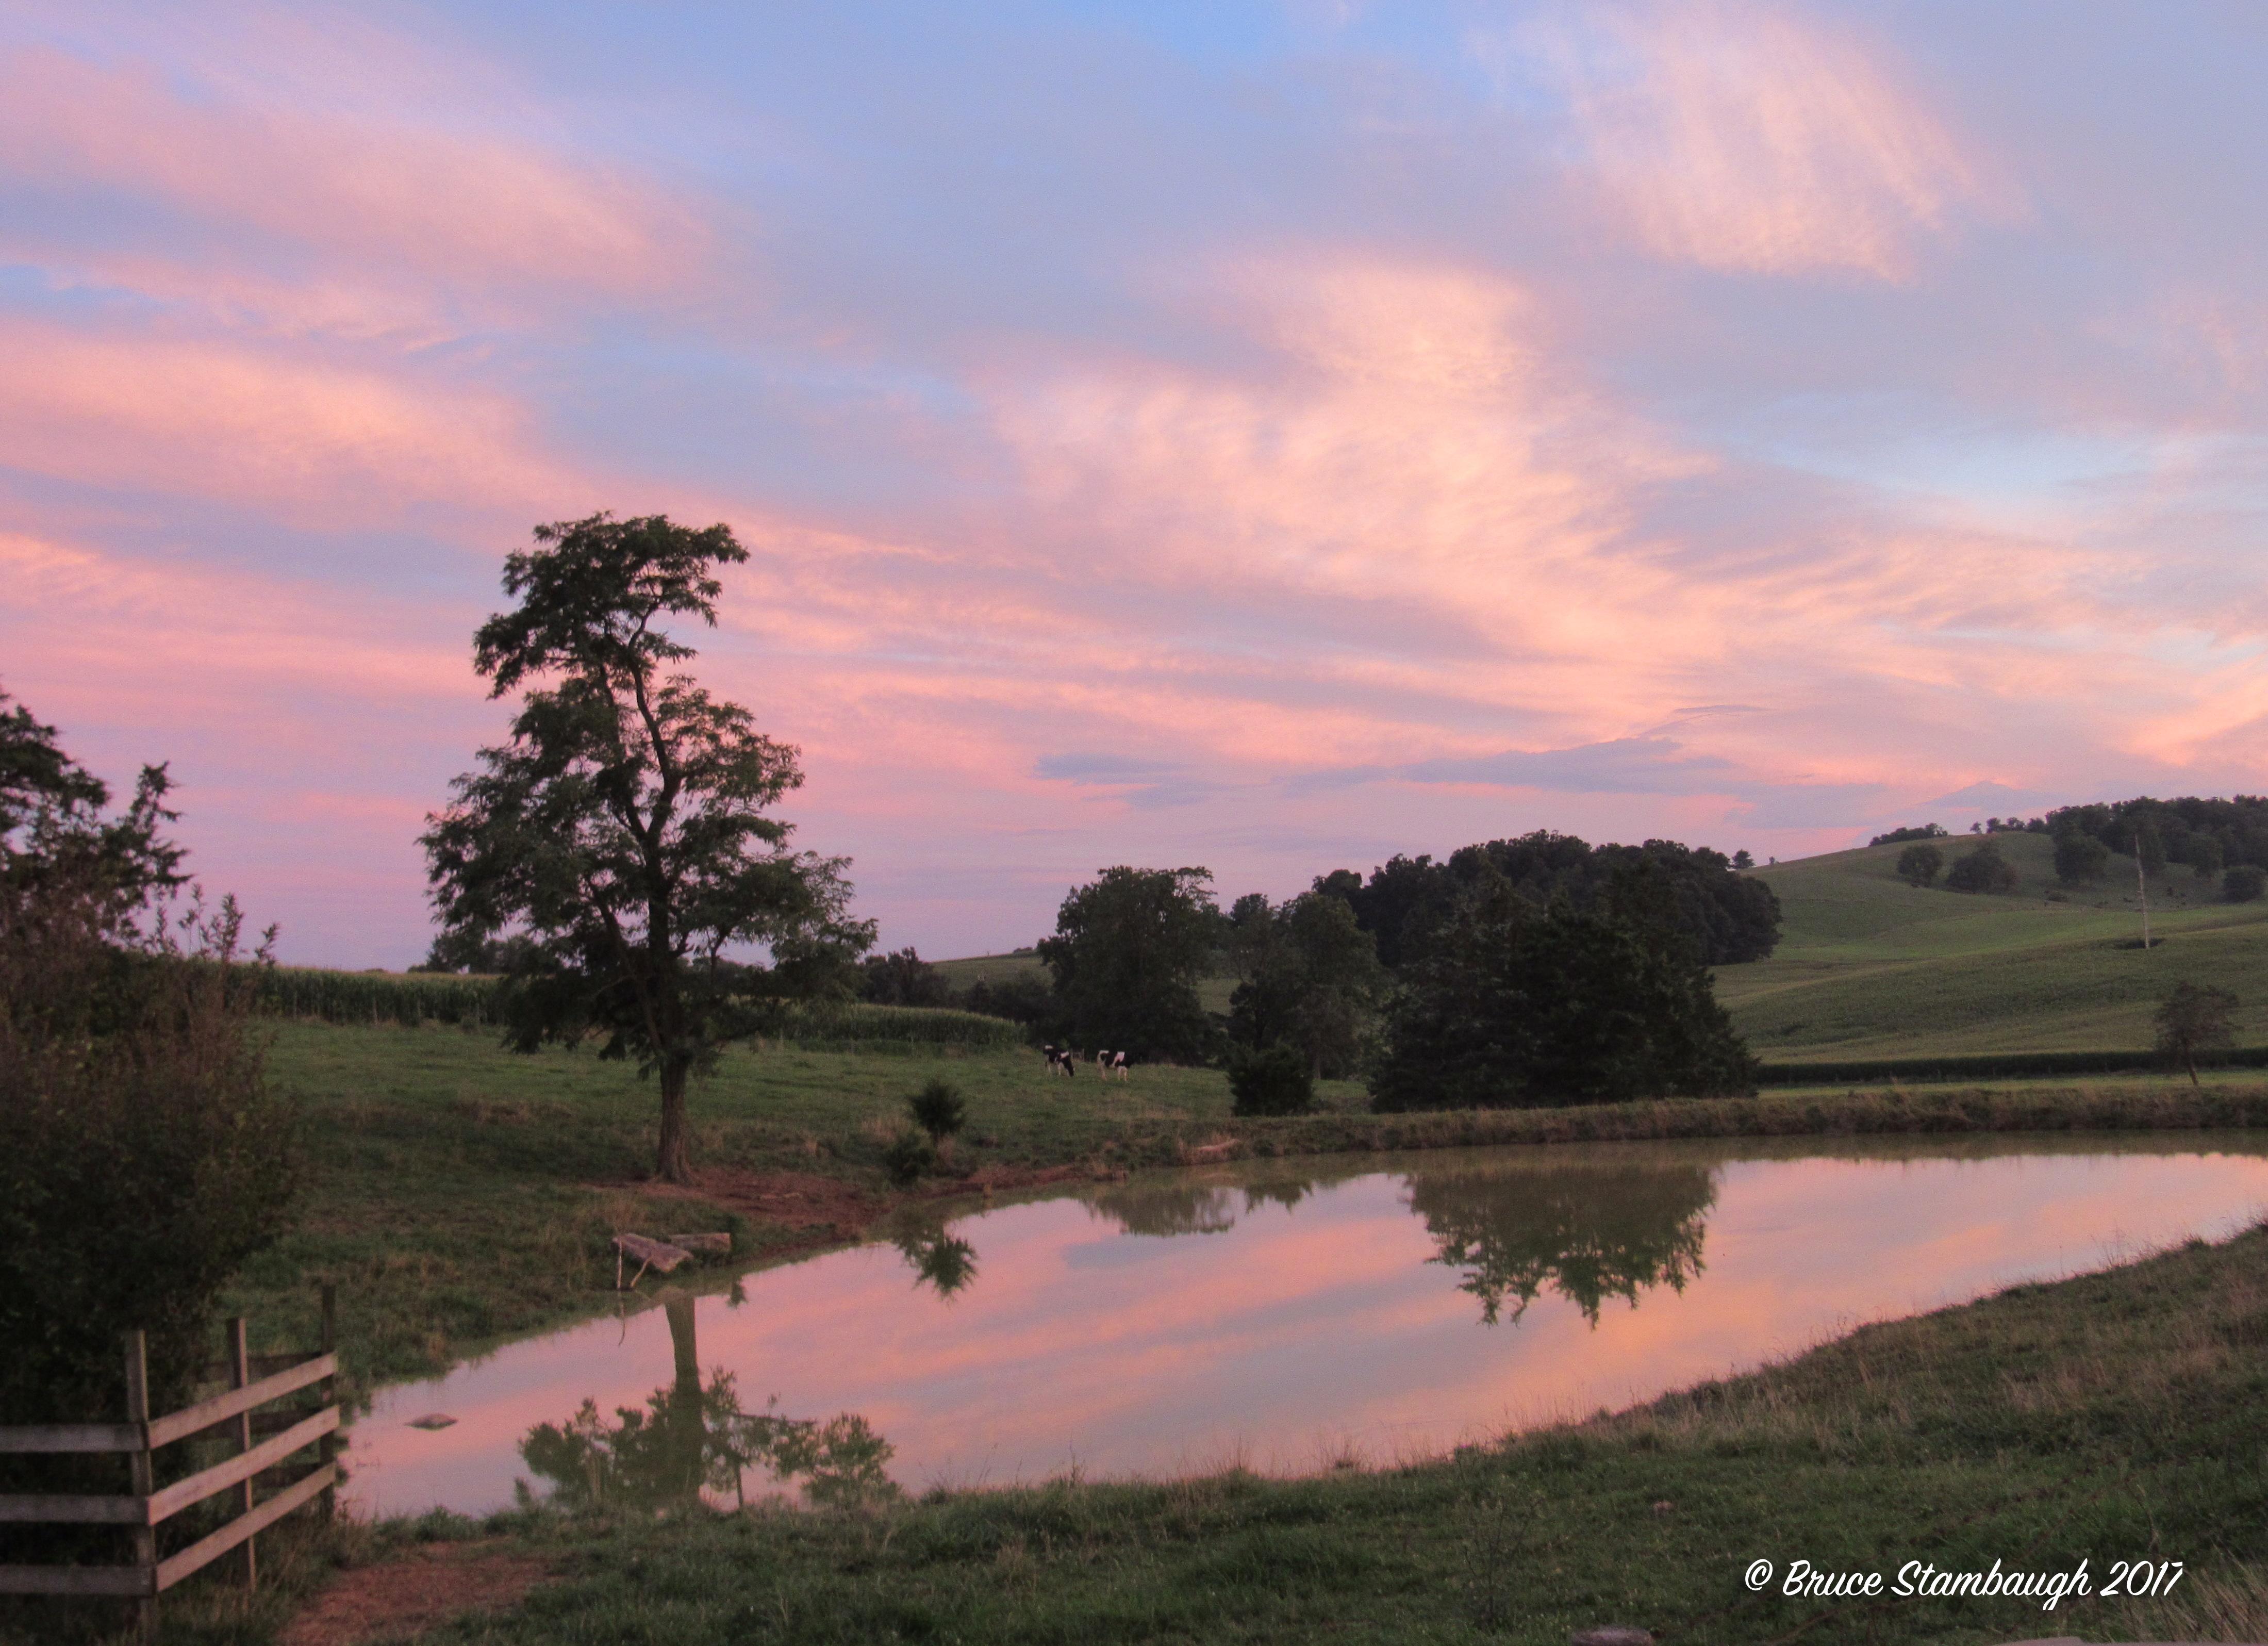 Reflections on a Farm Pond | Roadkill Crossing